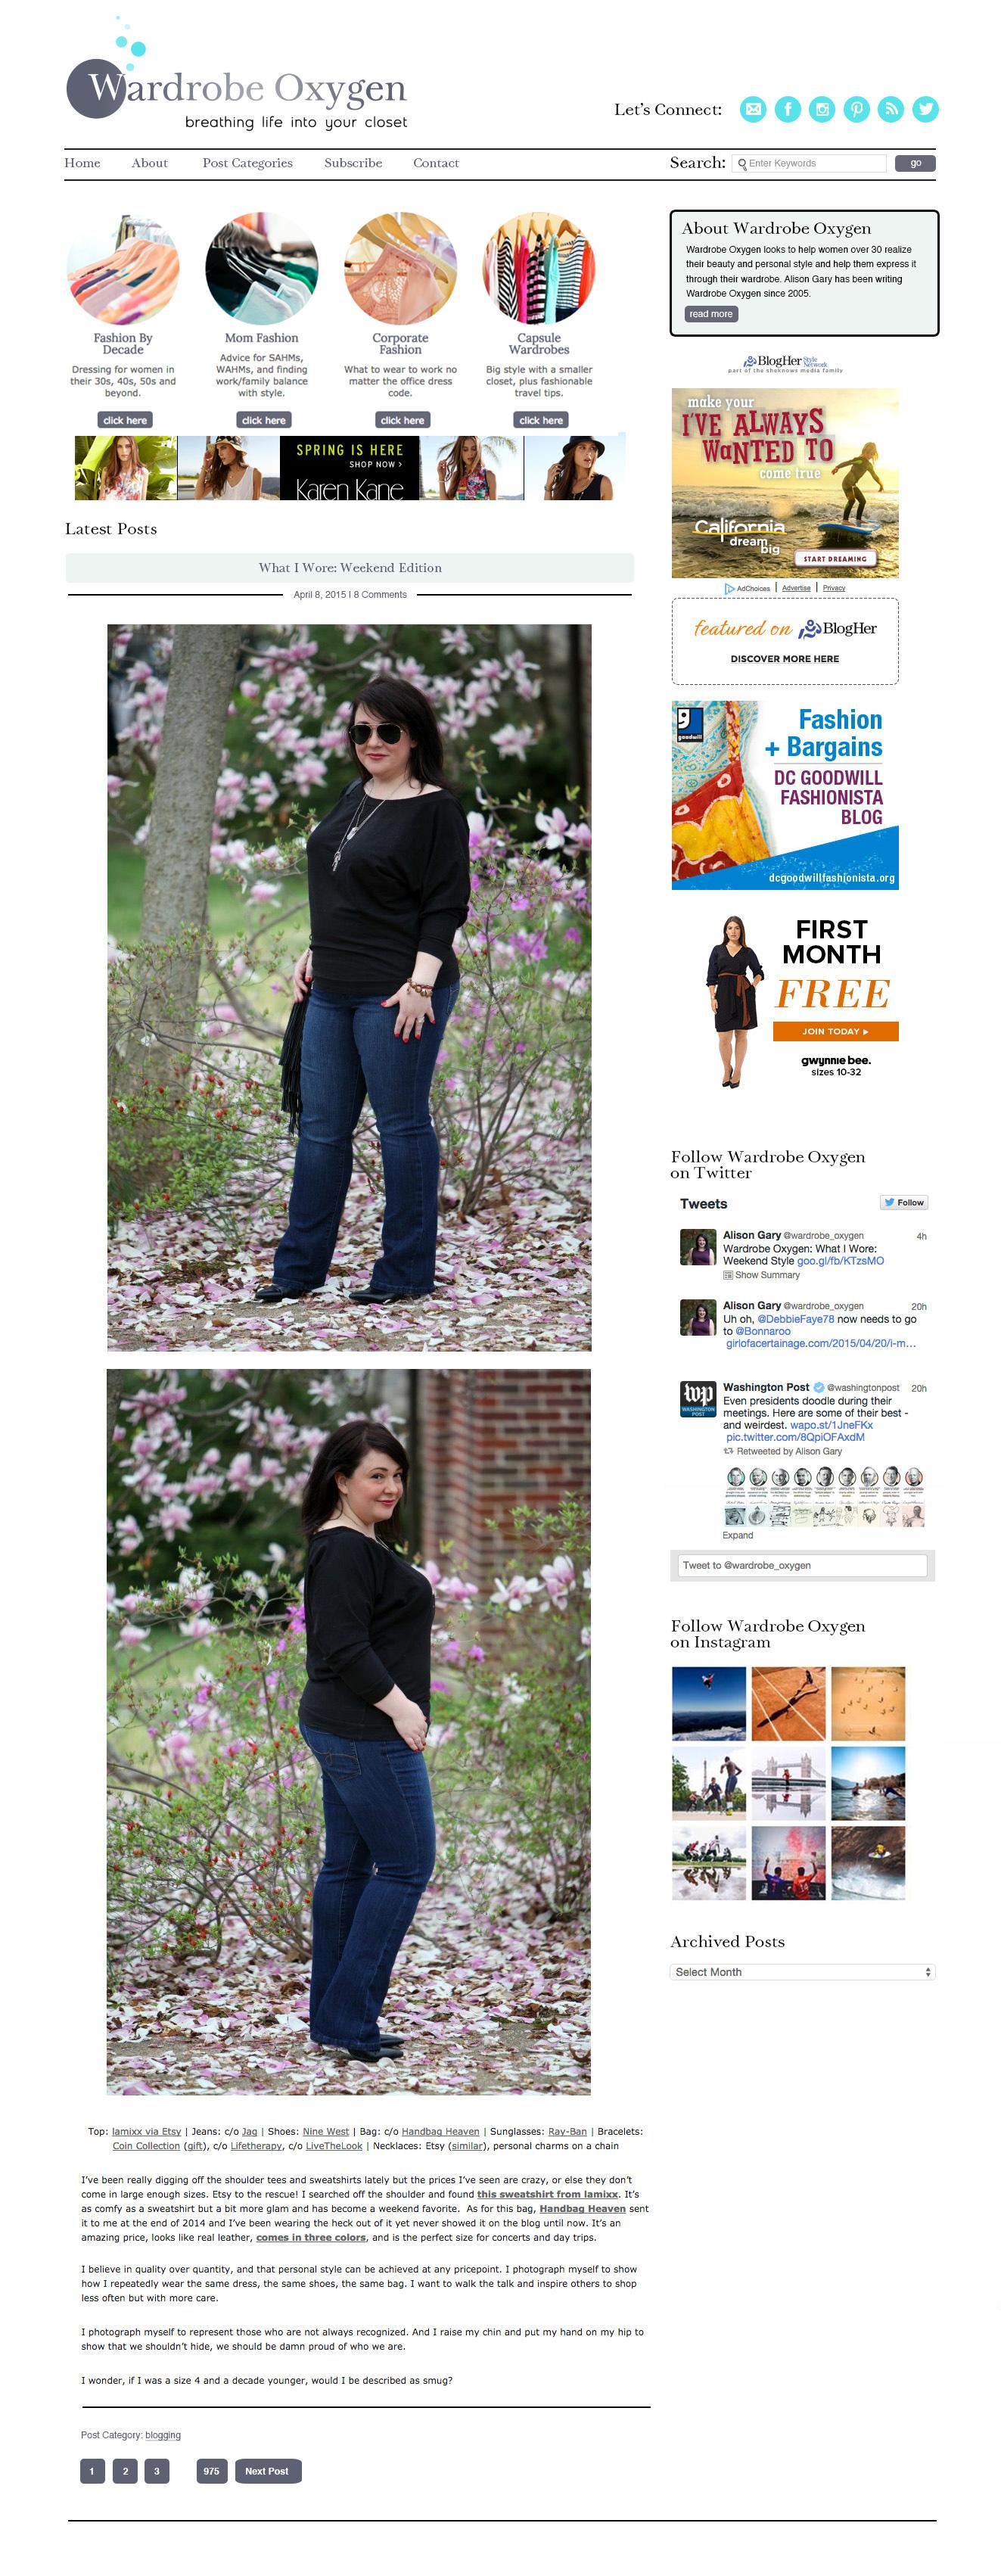 wardrobe oxygen website, fashion blog, fashion advice